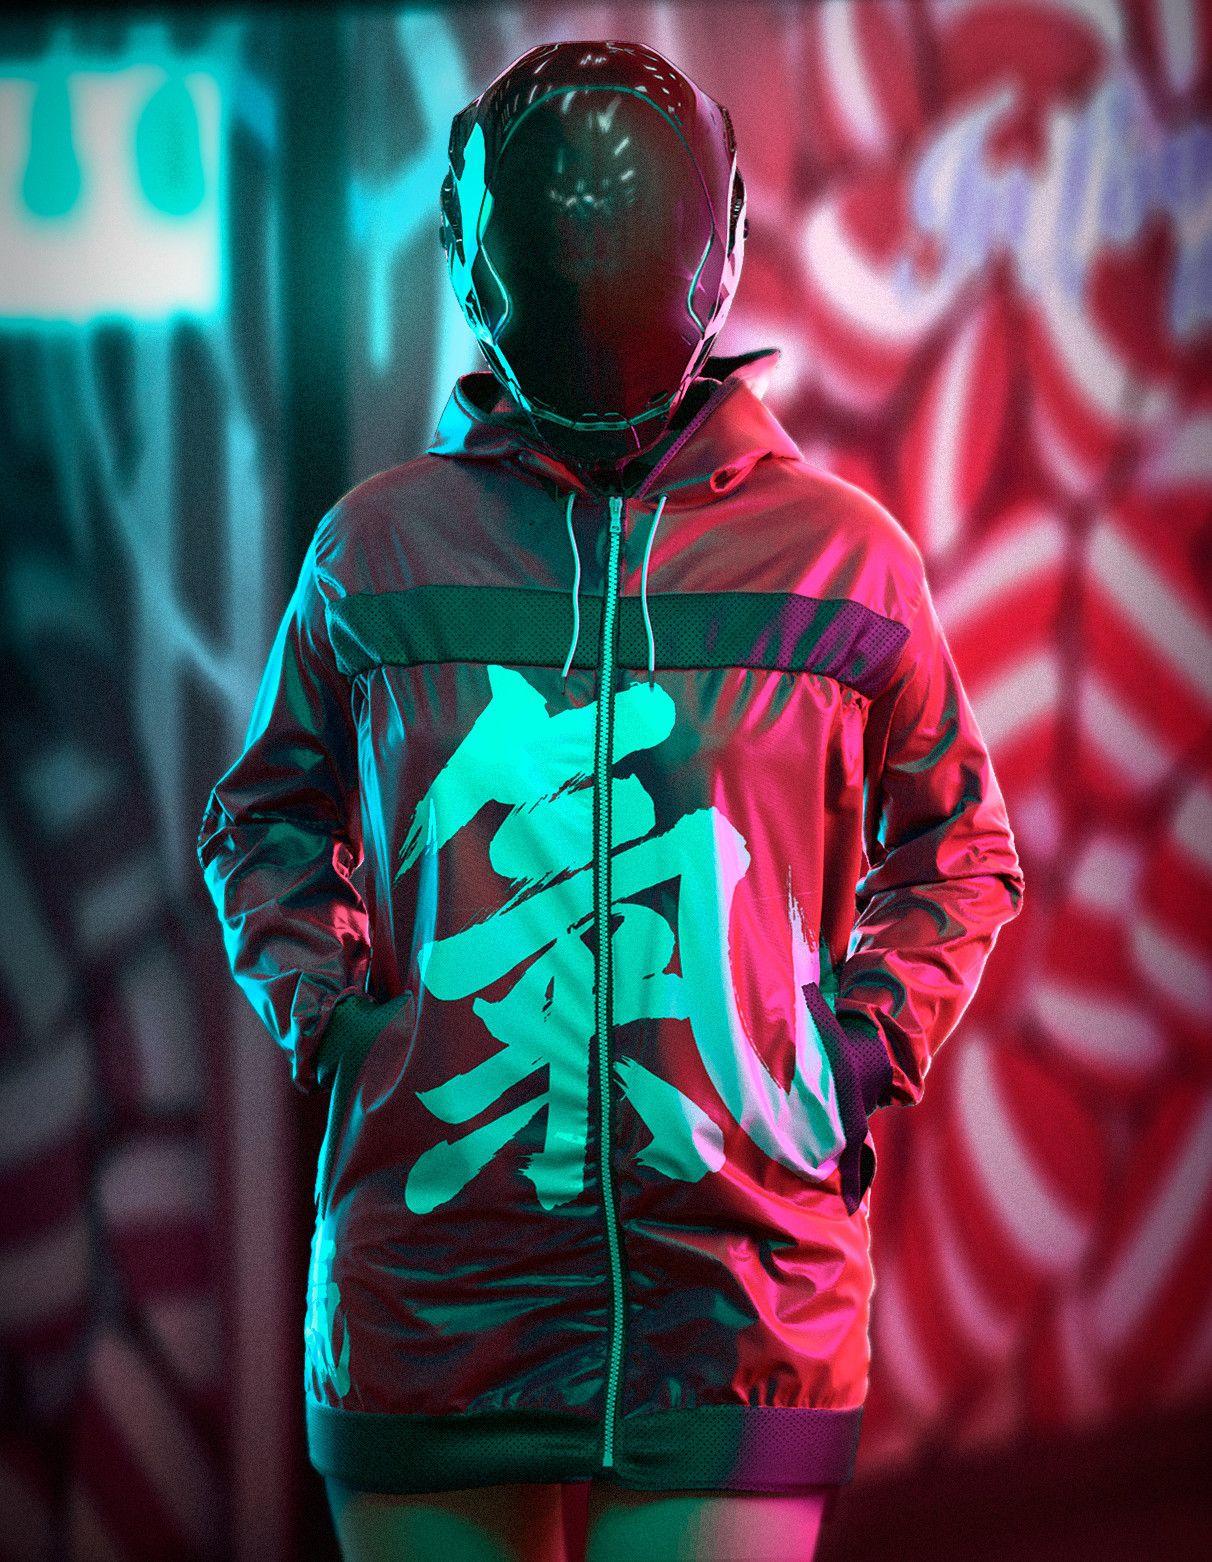 I.T.R.L ∆ (avec images) Mode cyberpunk, Art cyberpunk